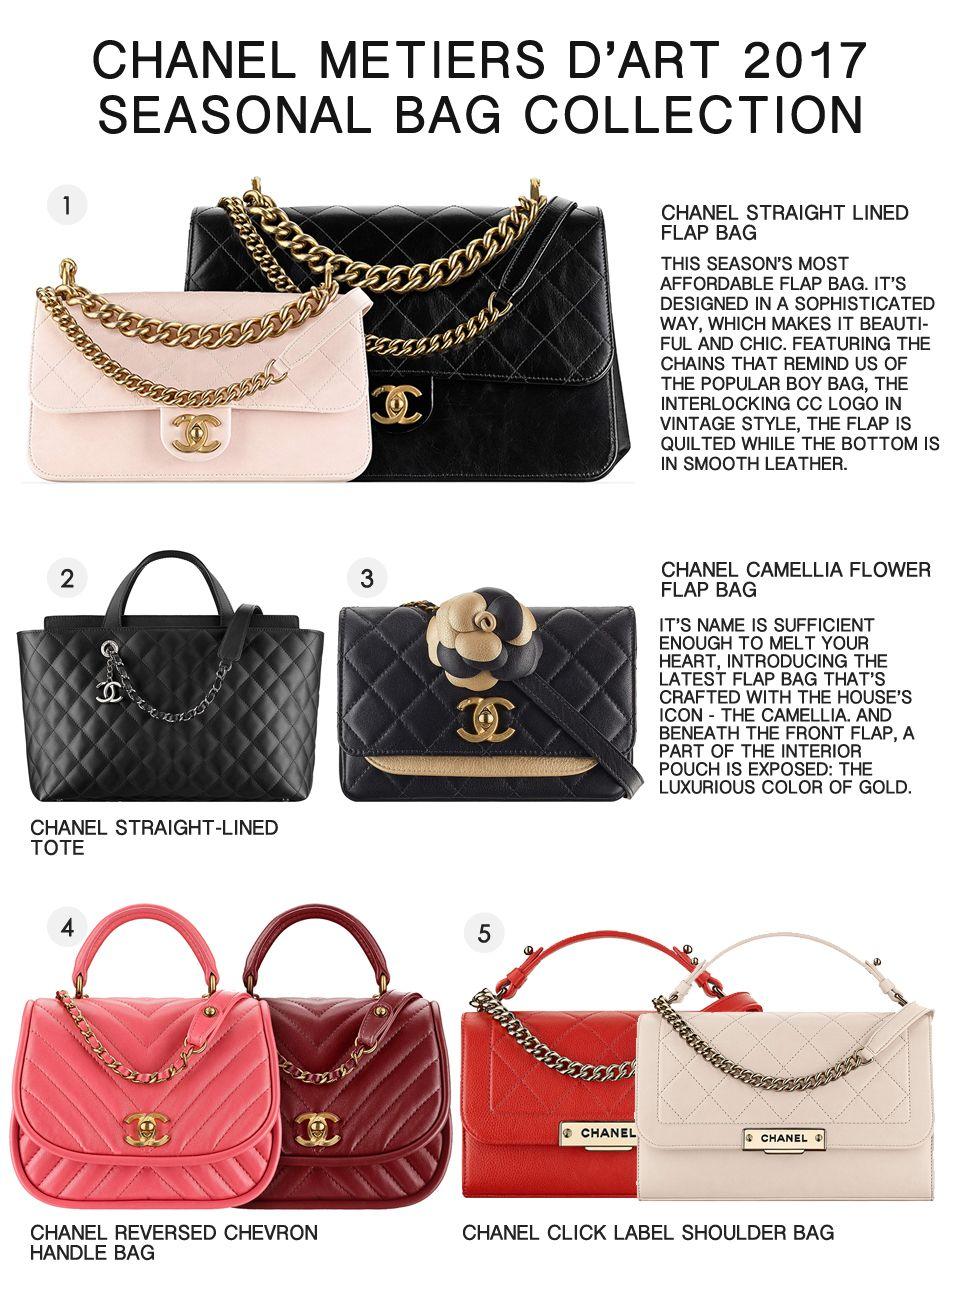 68c1d2c6715ee6 Chanel Pre-Fall 2017 Seasonal Bag Collection | Designer Bag Love ...